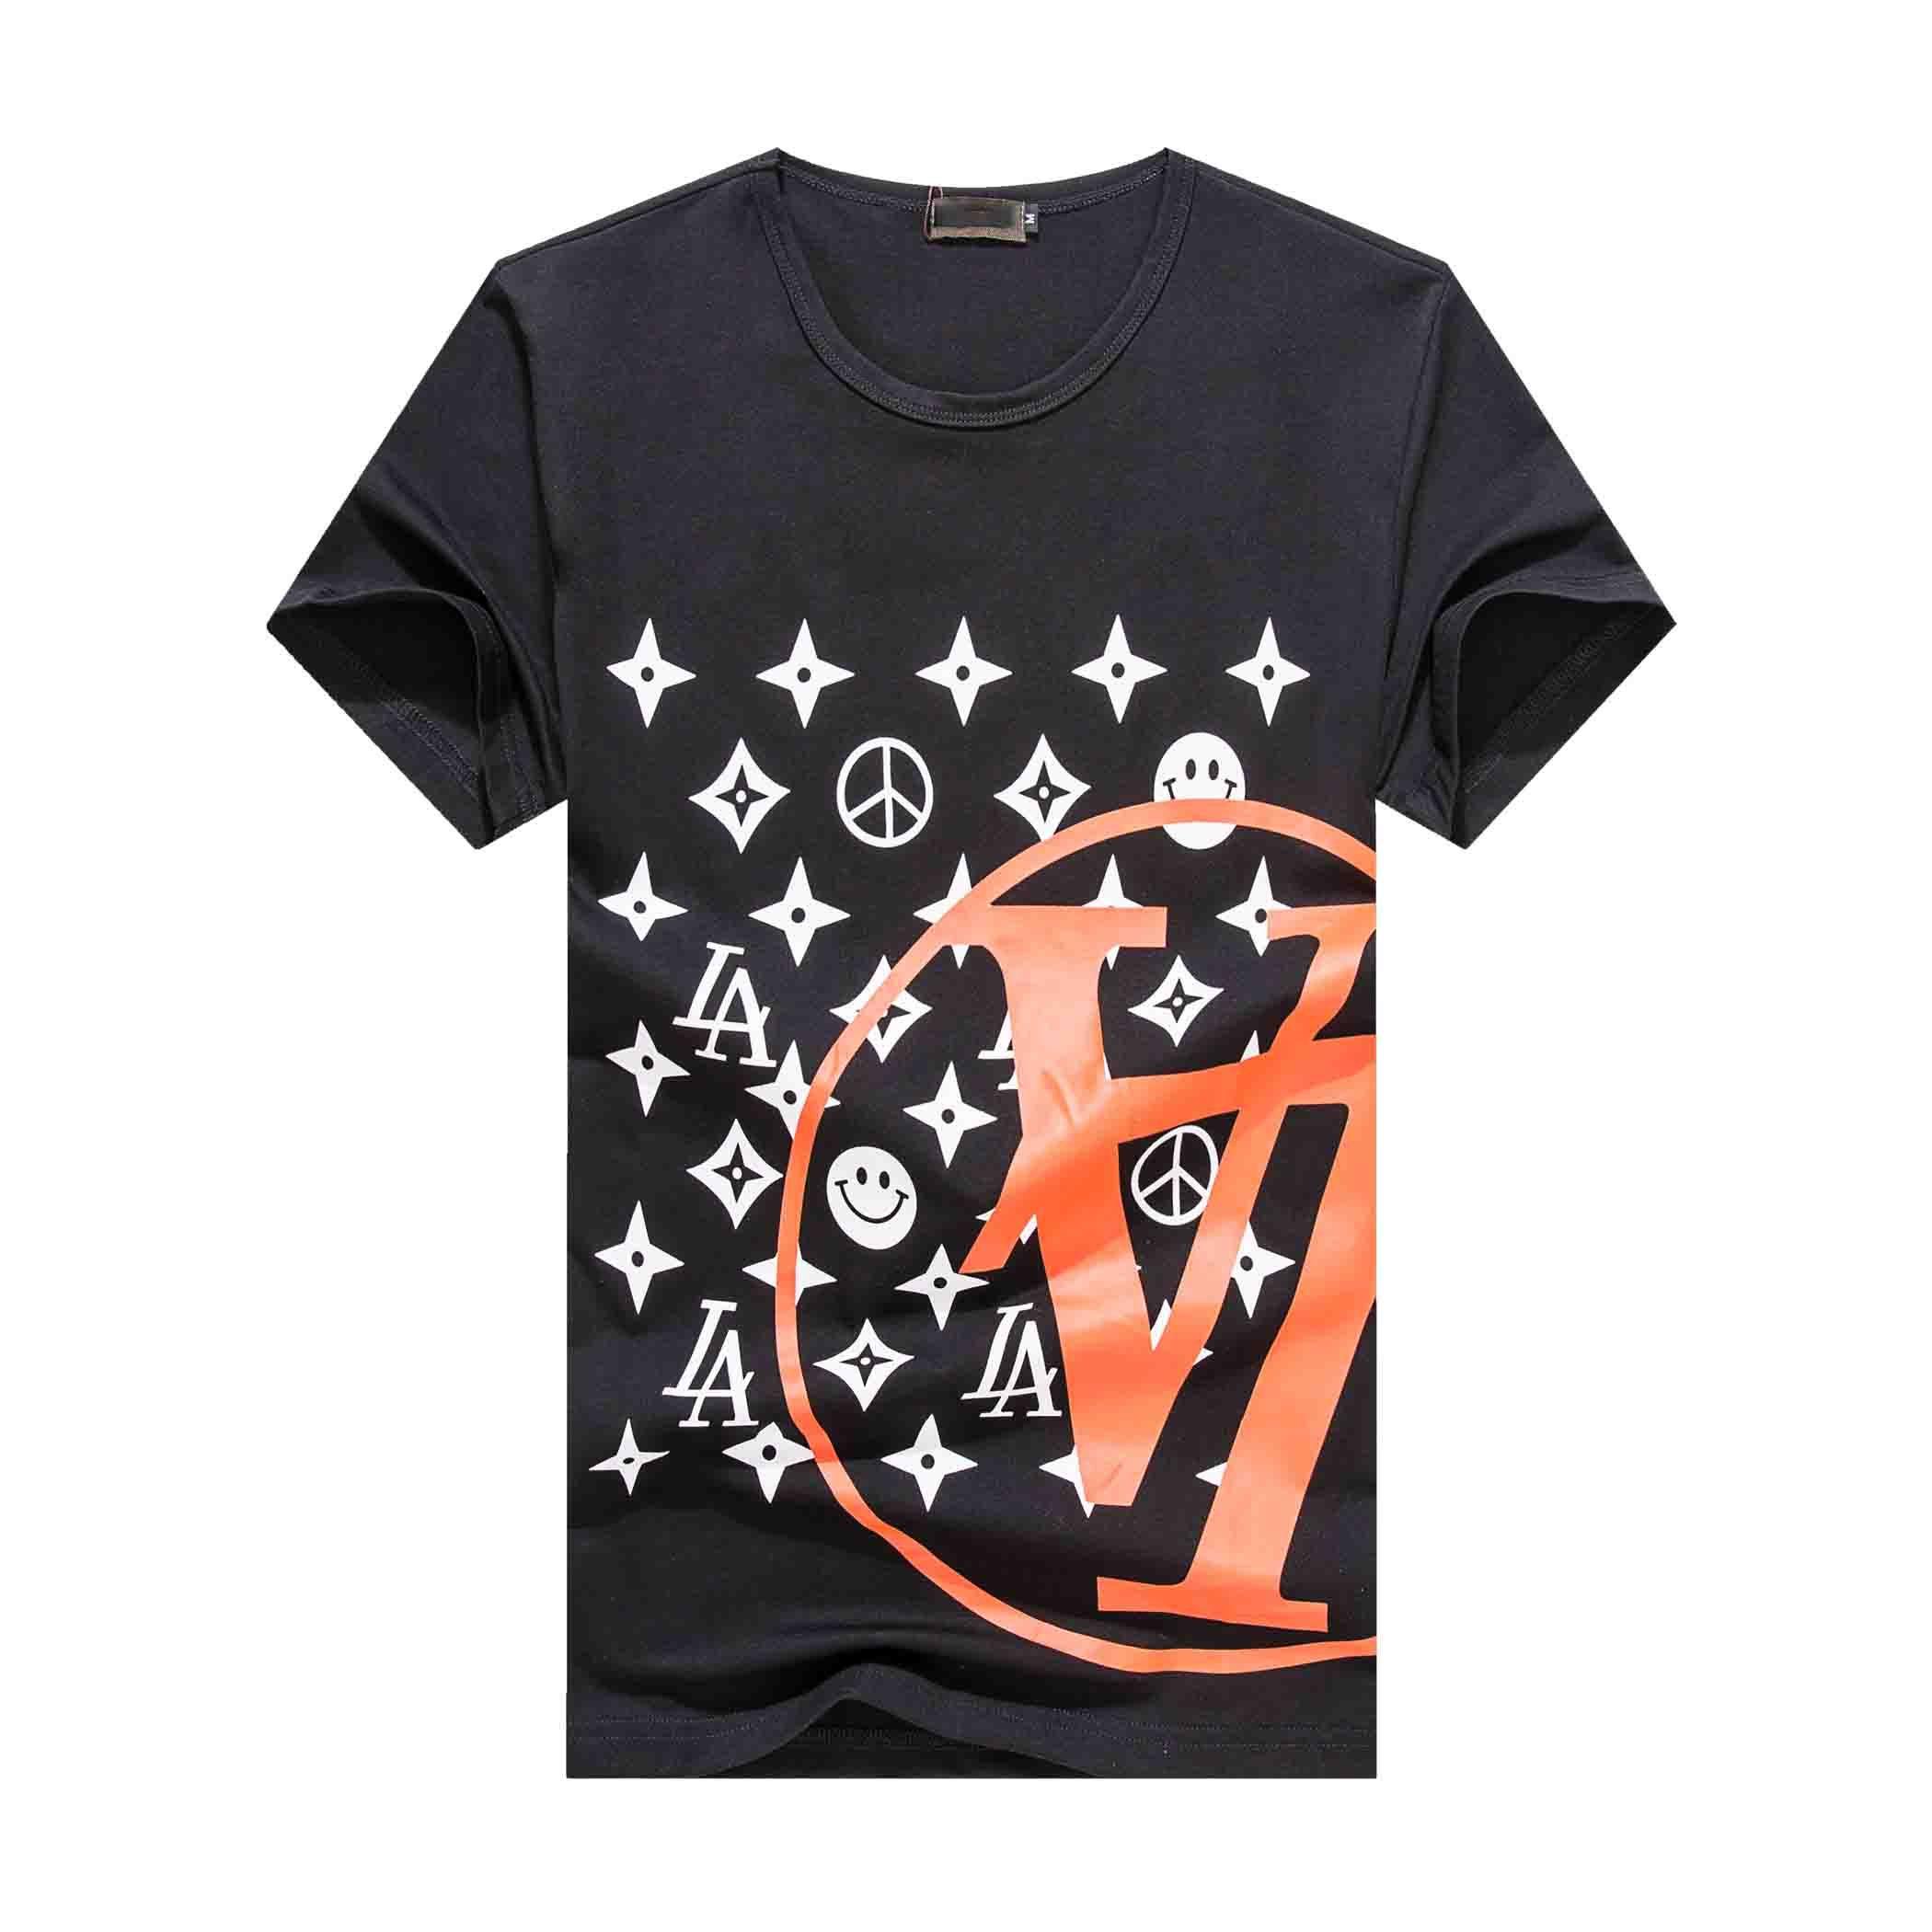 20ss Mens Designer T Shirts Fashion Mens Clothing Summer Casual Streetwear T Shirt Rivet Cotton Blend Crew Neck Short Sleeve